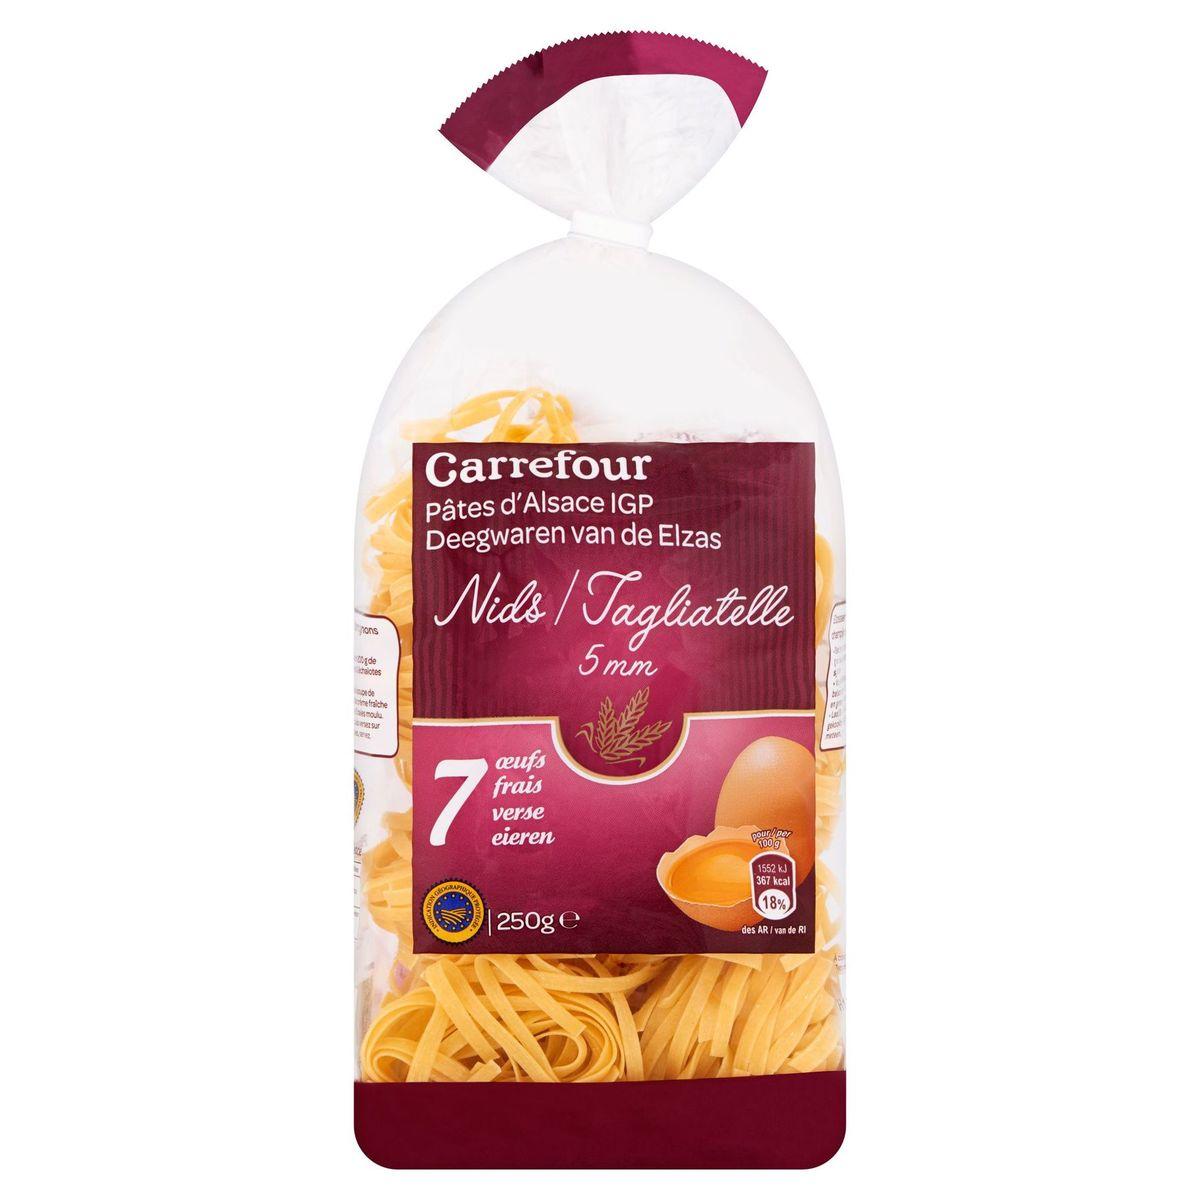 Carrefour Deegwaren van de Elzas Tagliatelle 7 Verse Eieren 5 mm 250 g